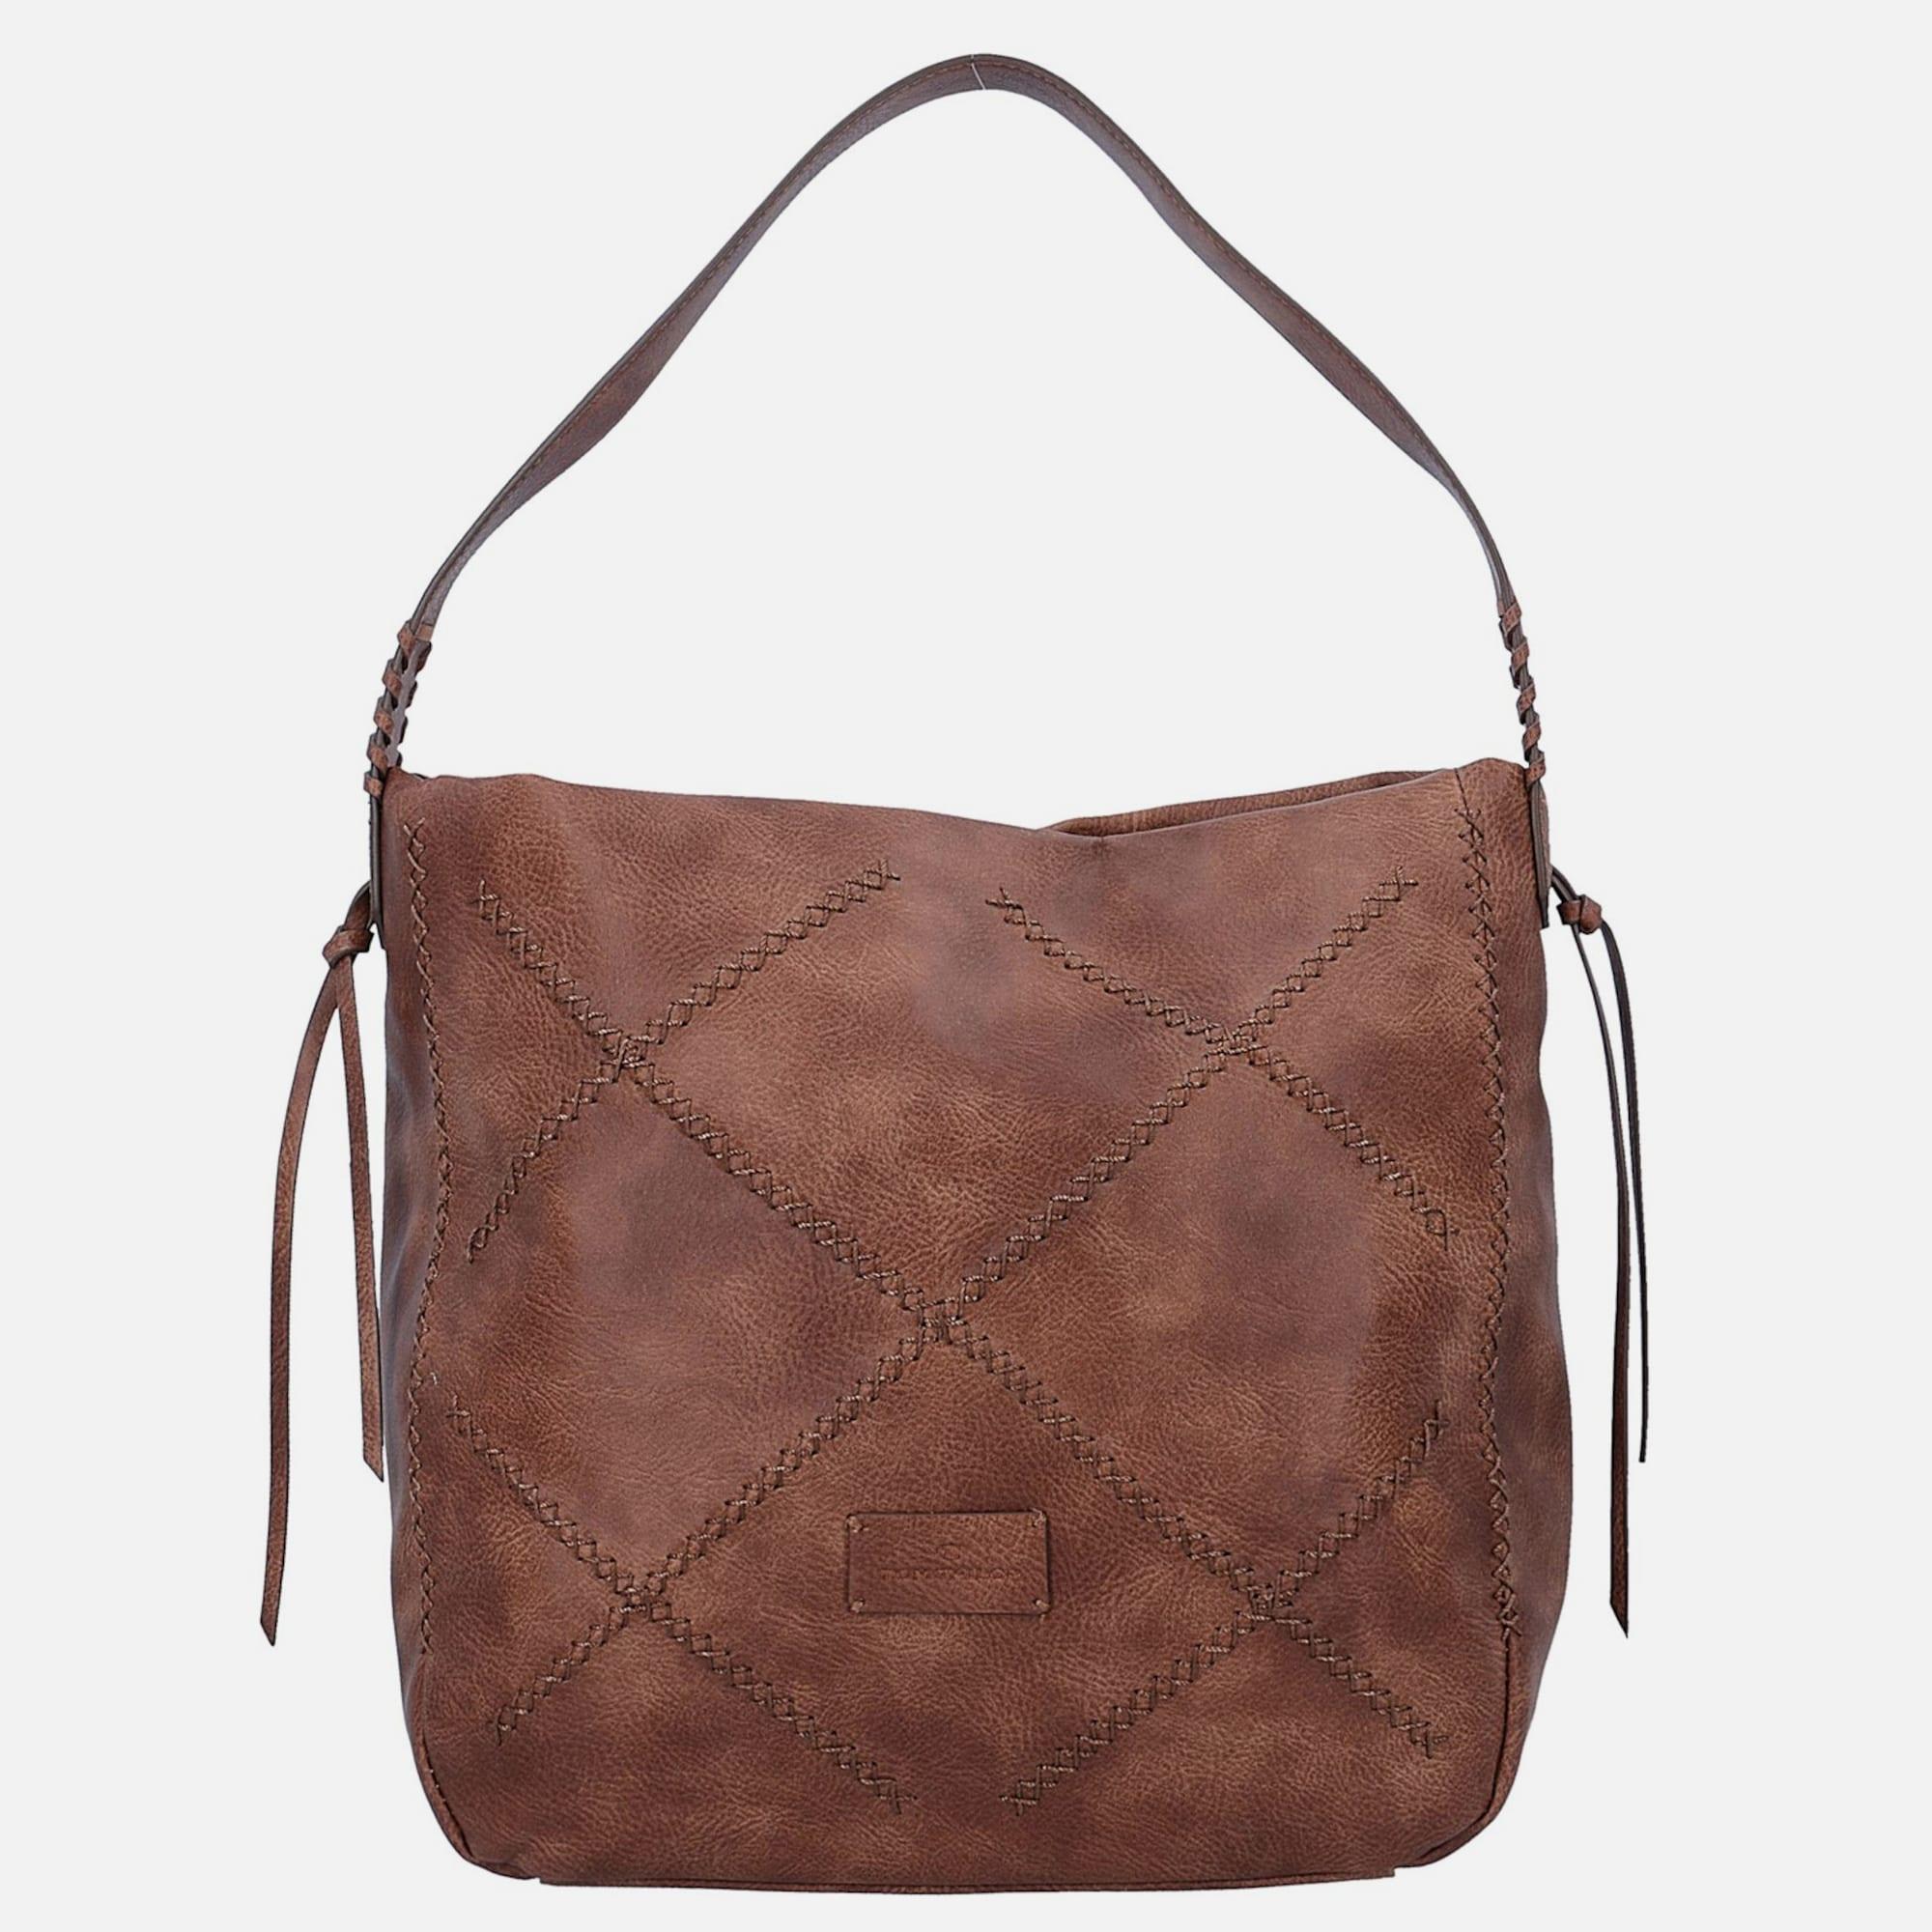 tom tailor 39 keyla 39 handtasche in braun about you. Black Bedroom Furniture Sets. Home Design Ideas